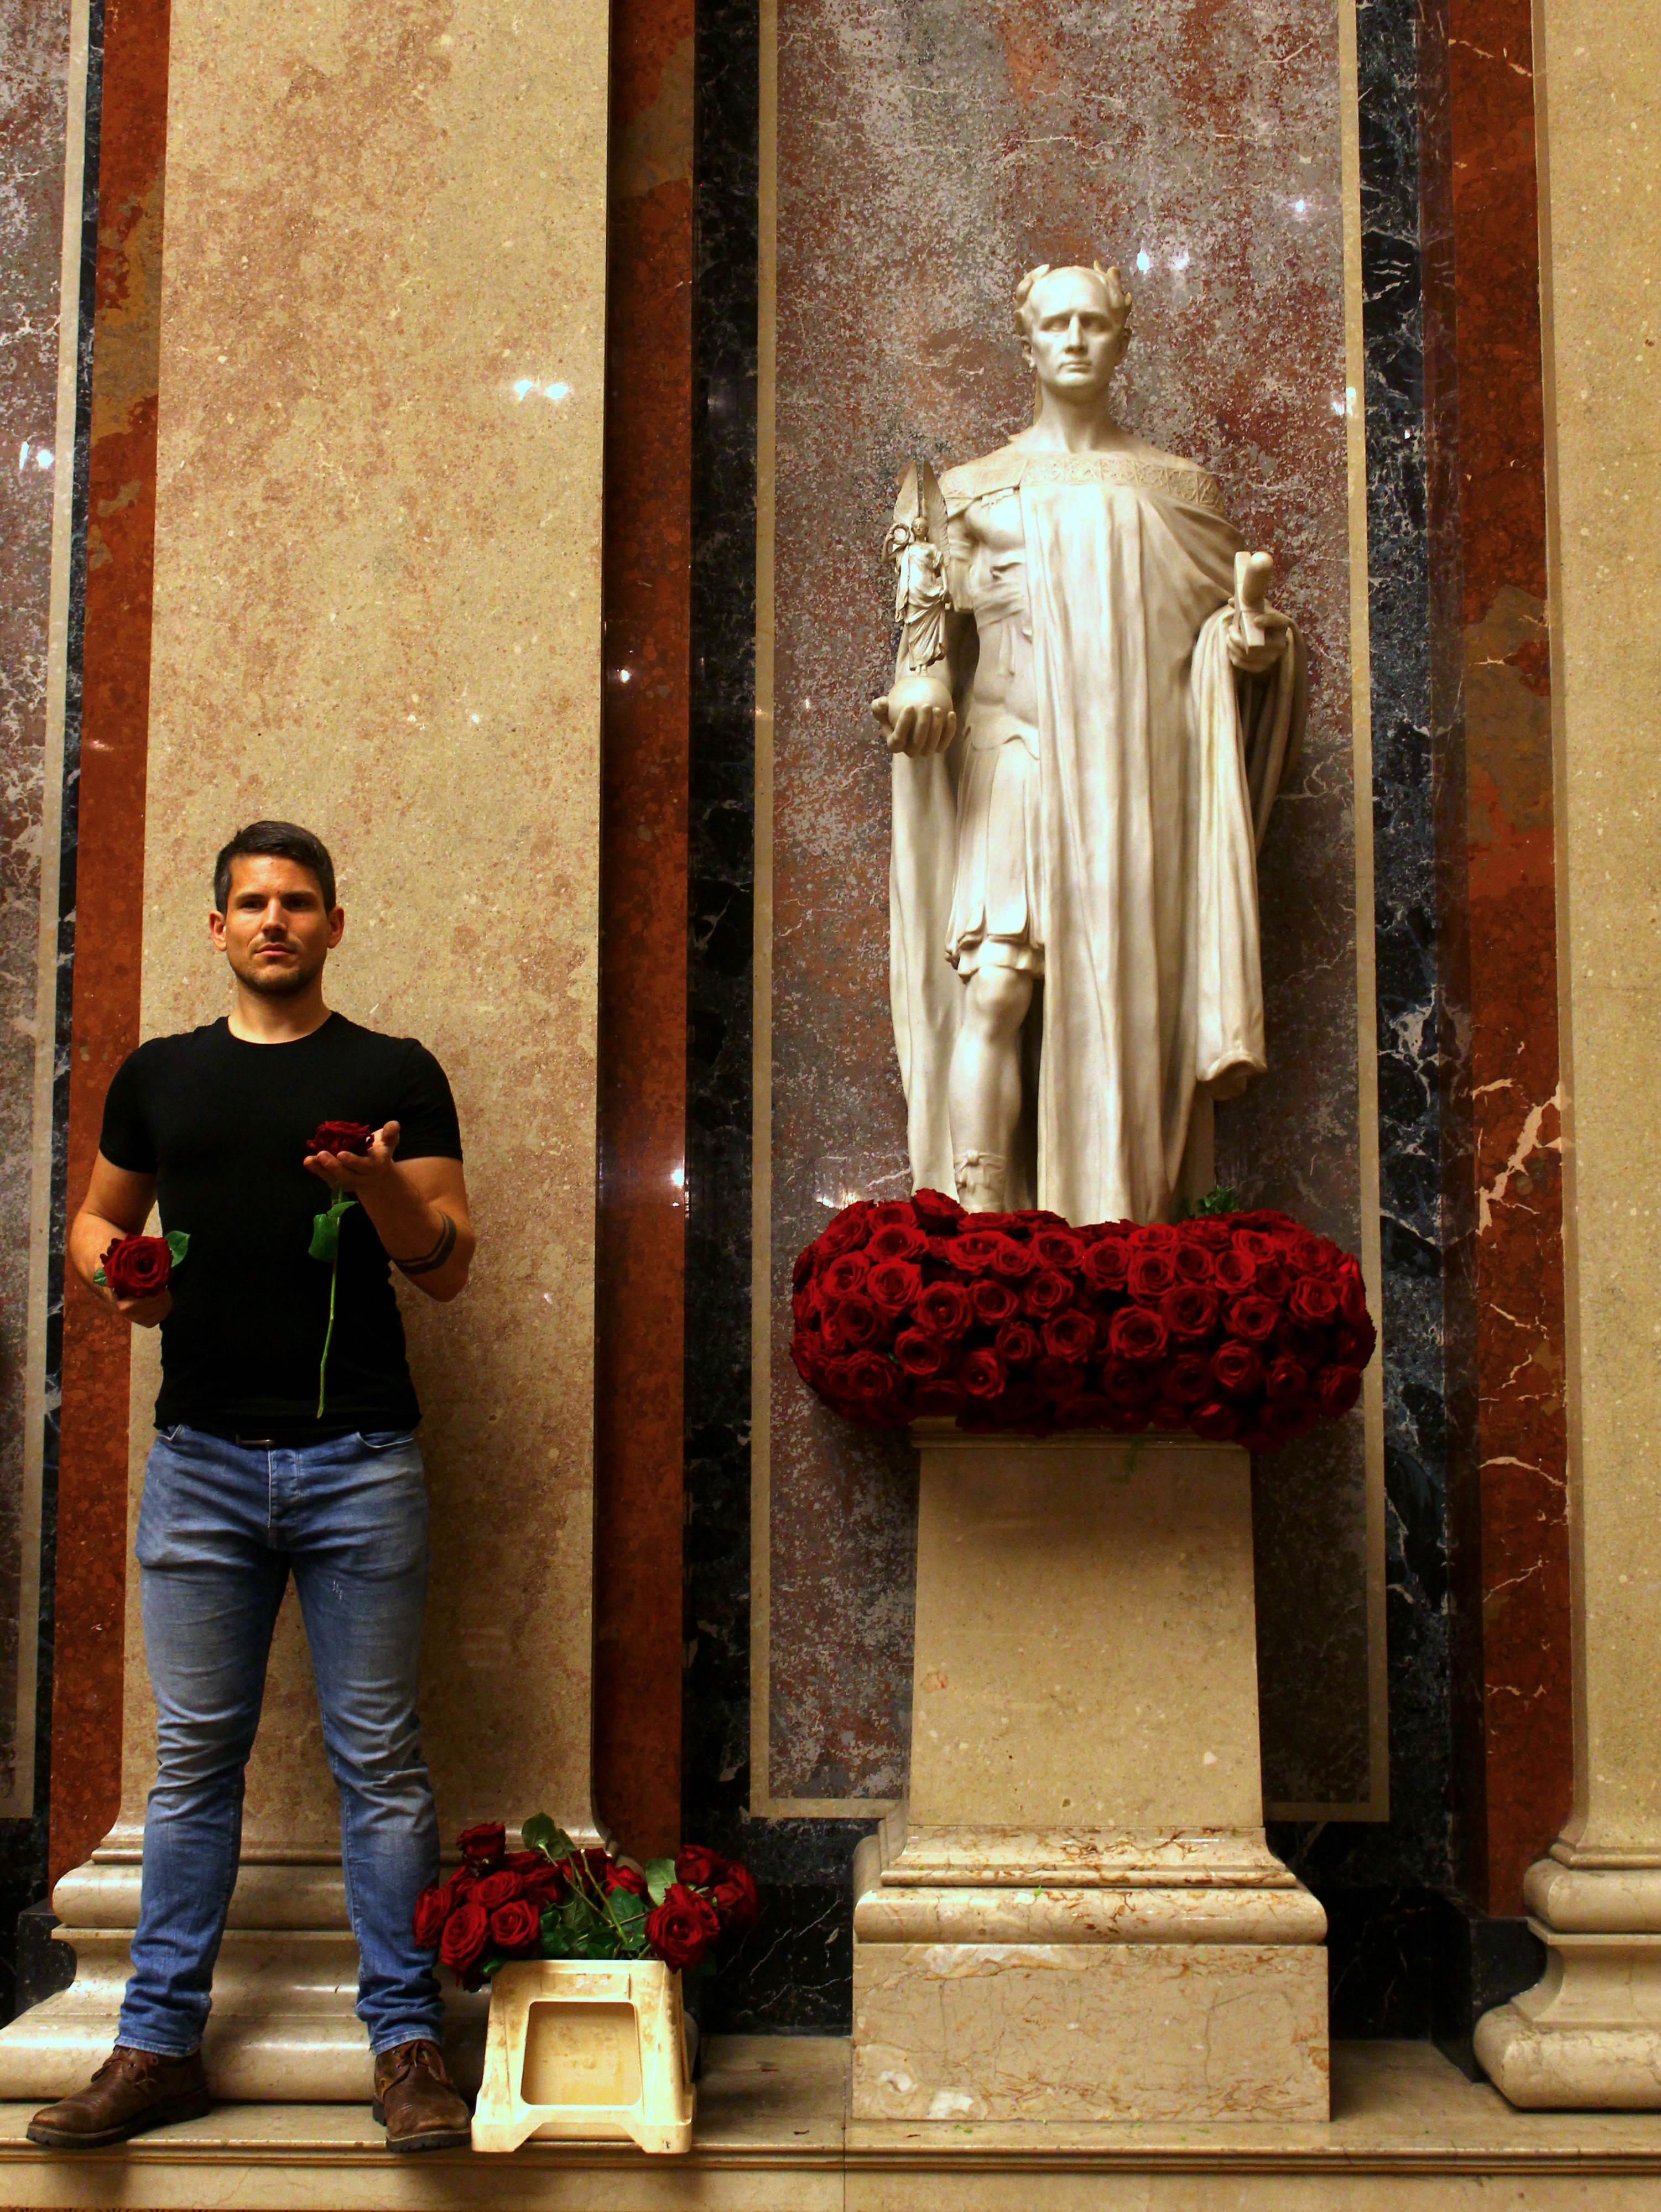 Timo bolte Austrian President inauguration porta nova red naomi 2